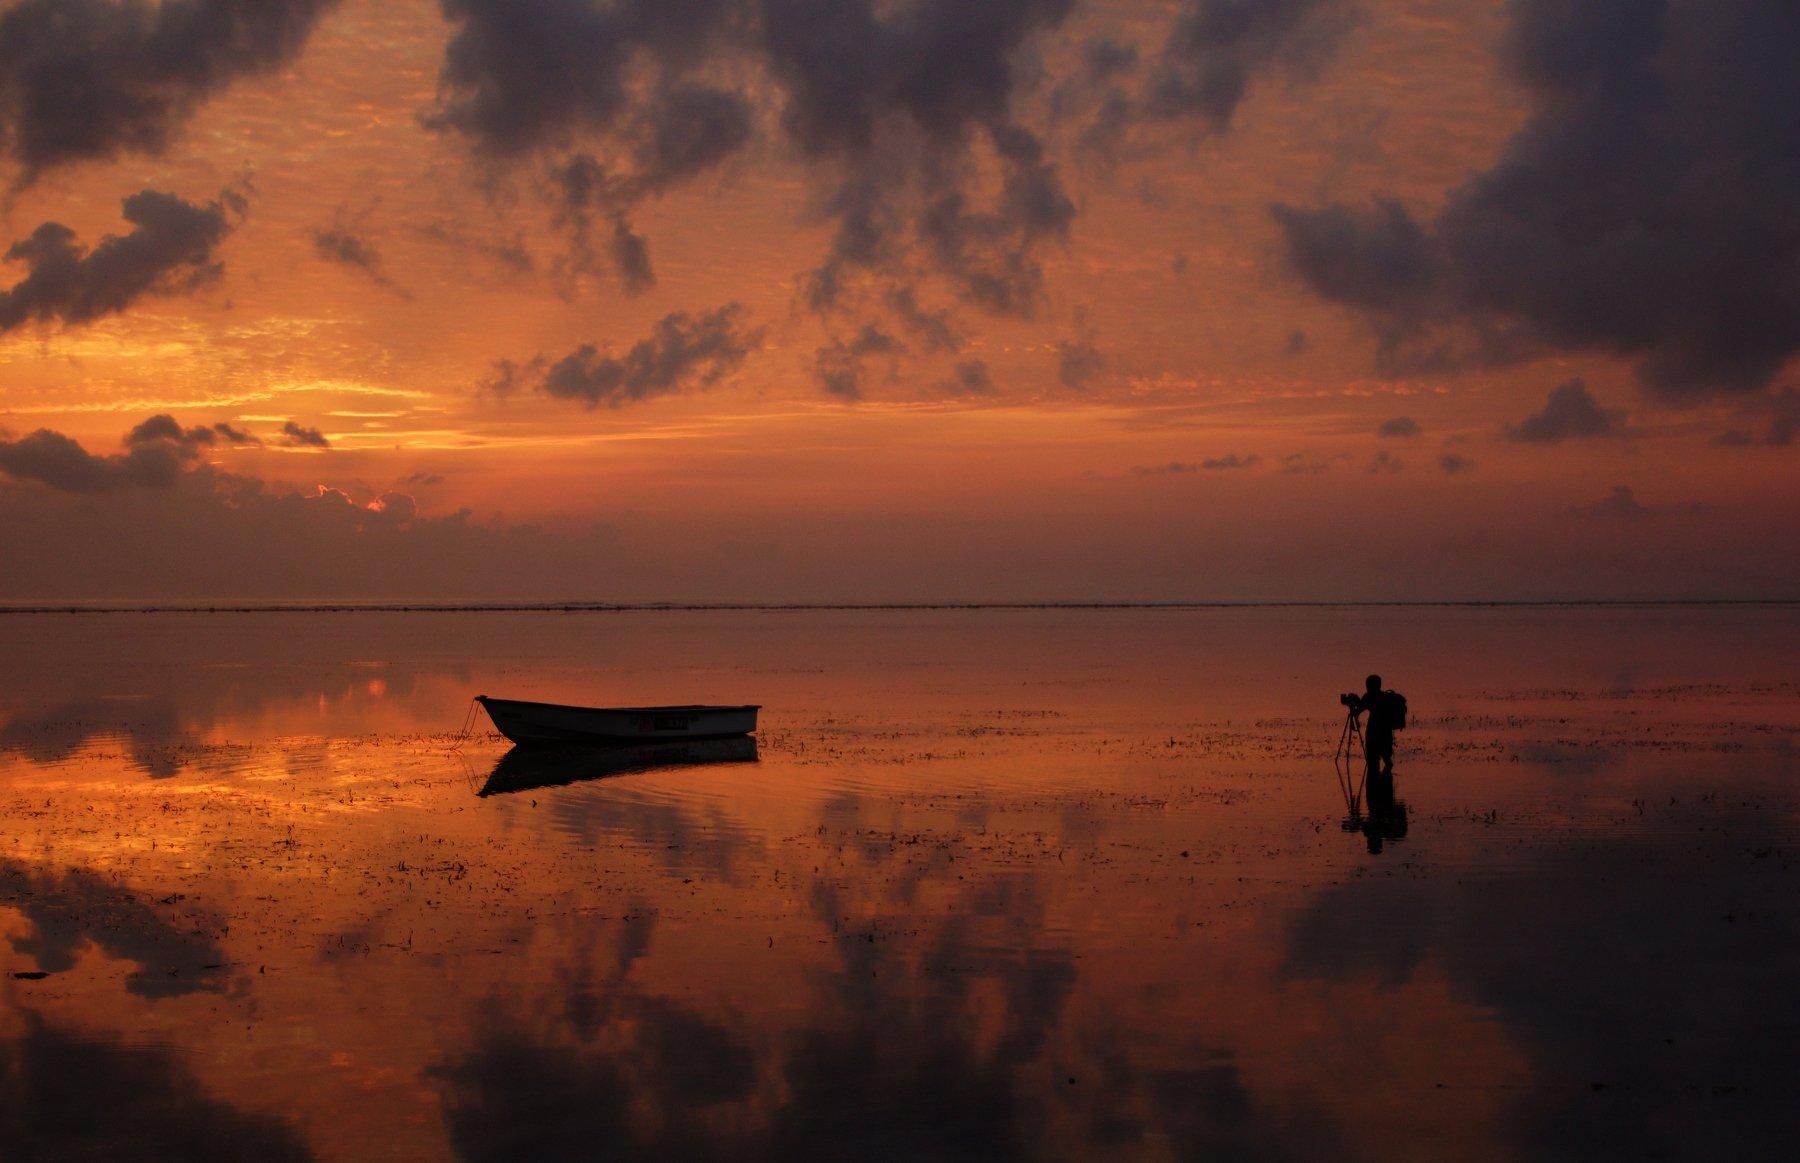 morning, work, dawn, sunrise, boat, beach, ocean, Сергей Андреевич